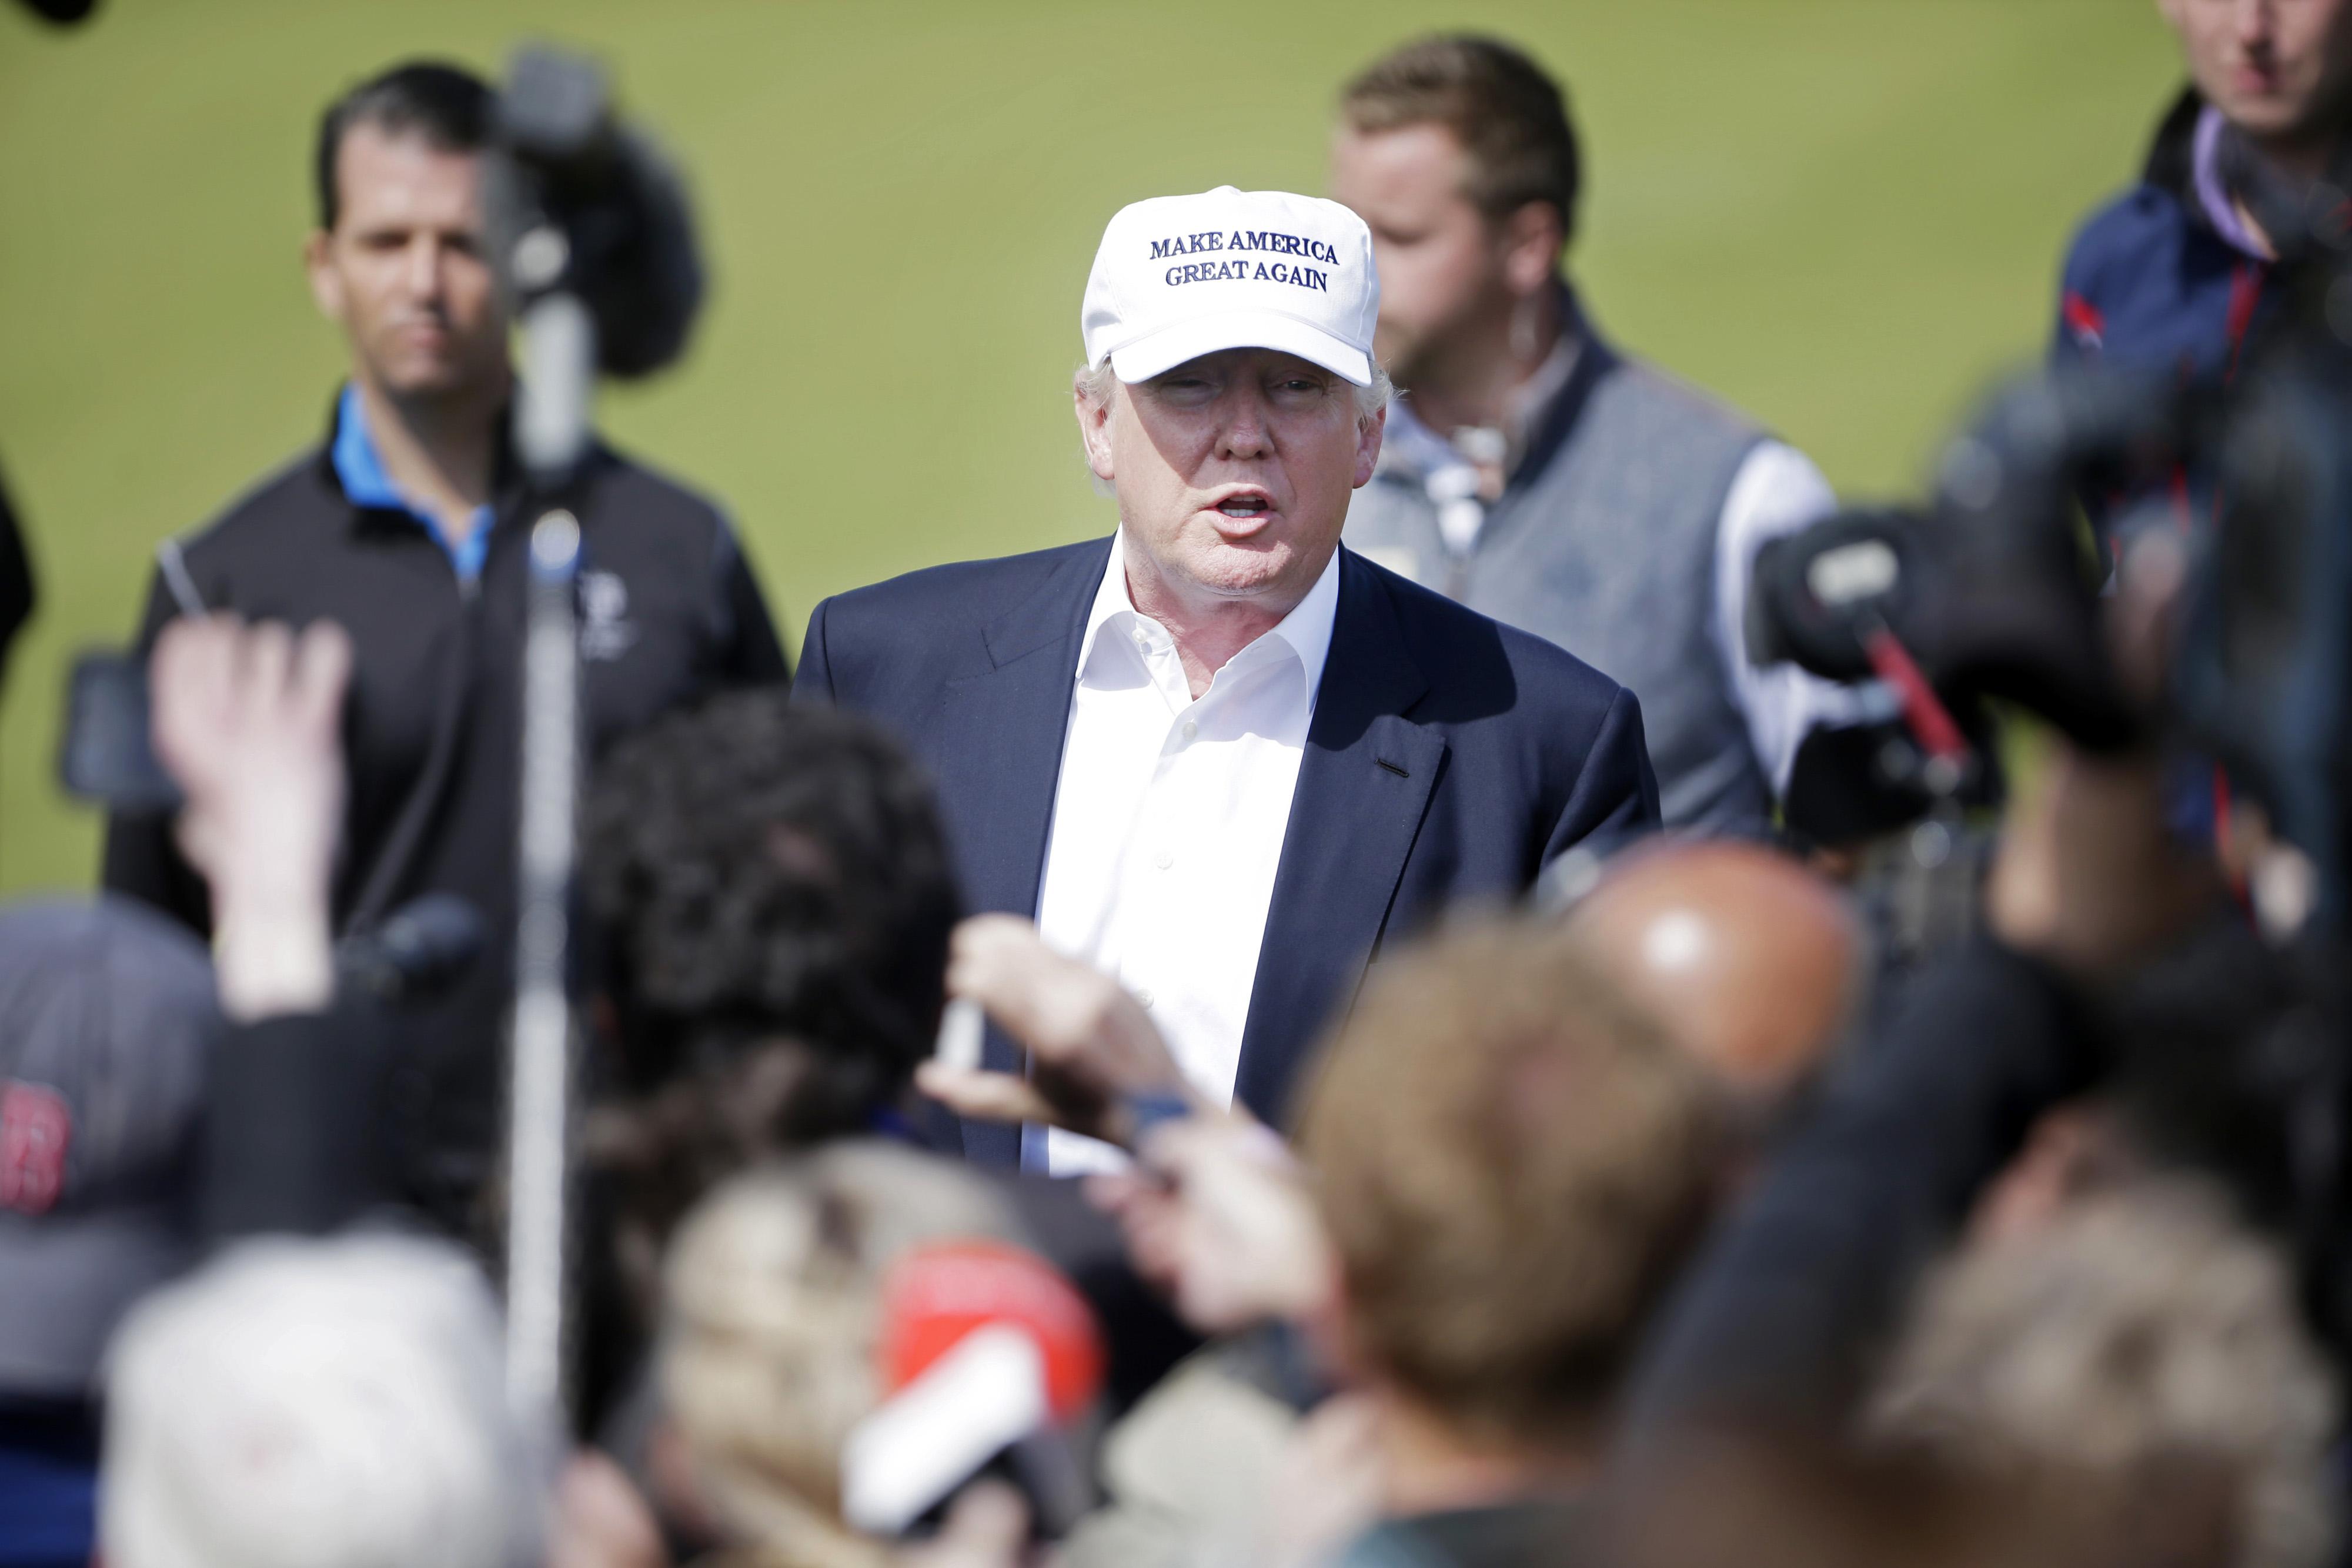 Presumptive Republican Presidential Nominee Donald Trump Re-Opens  Trump Turnberry Golf Course And Hotel Following Refurbishment